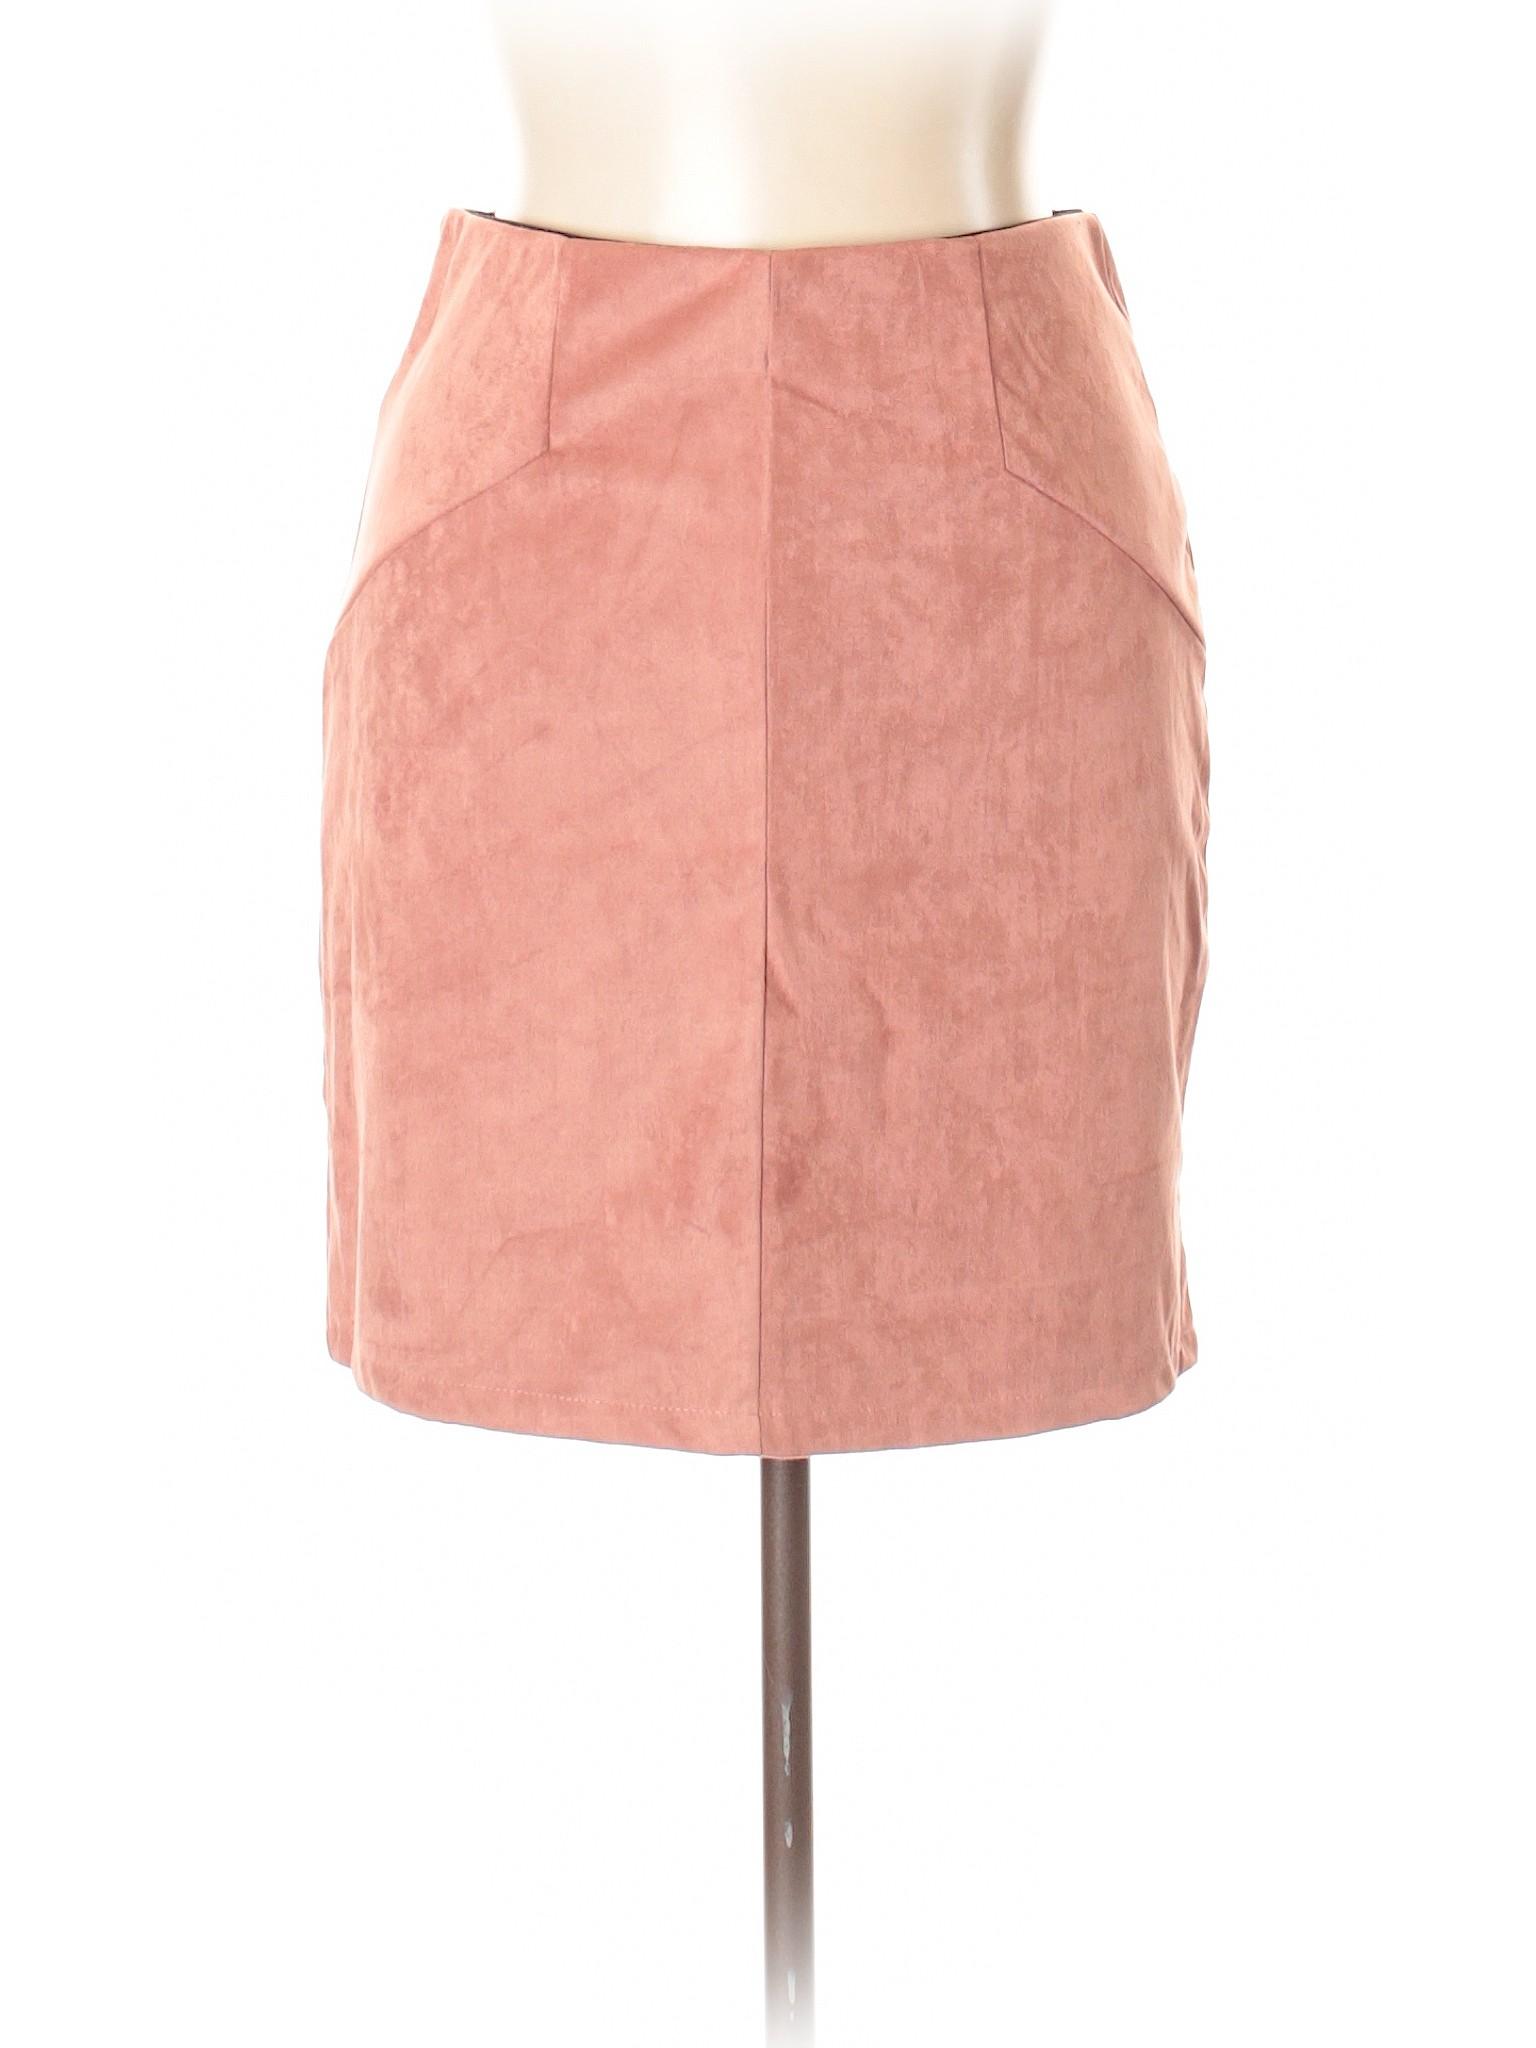 Boutique Casual Skirt Boutique Boutique Skirt Casual qgtOy